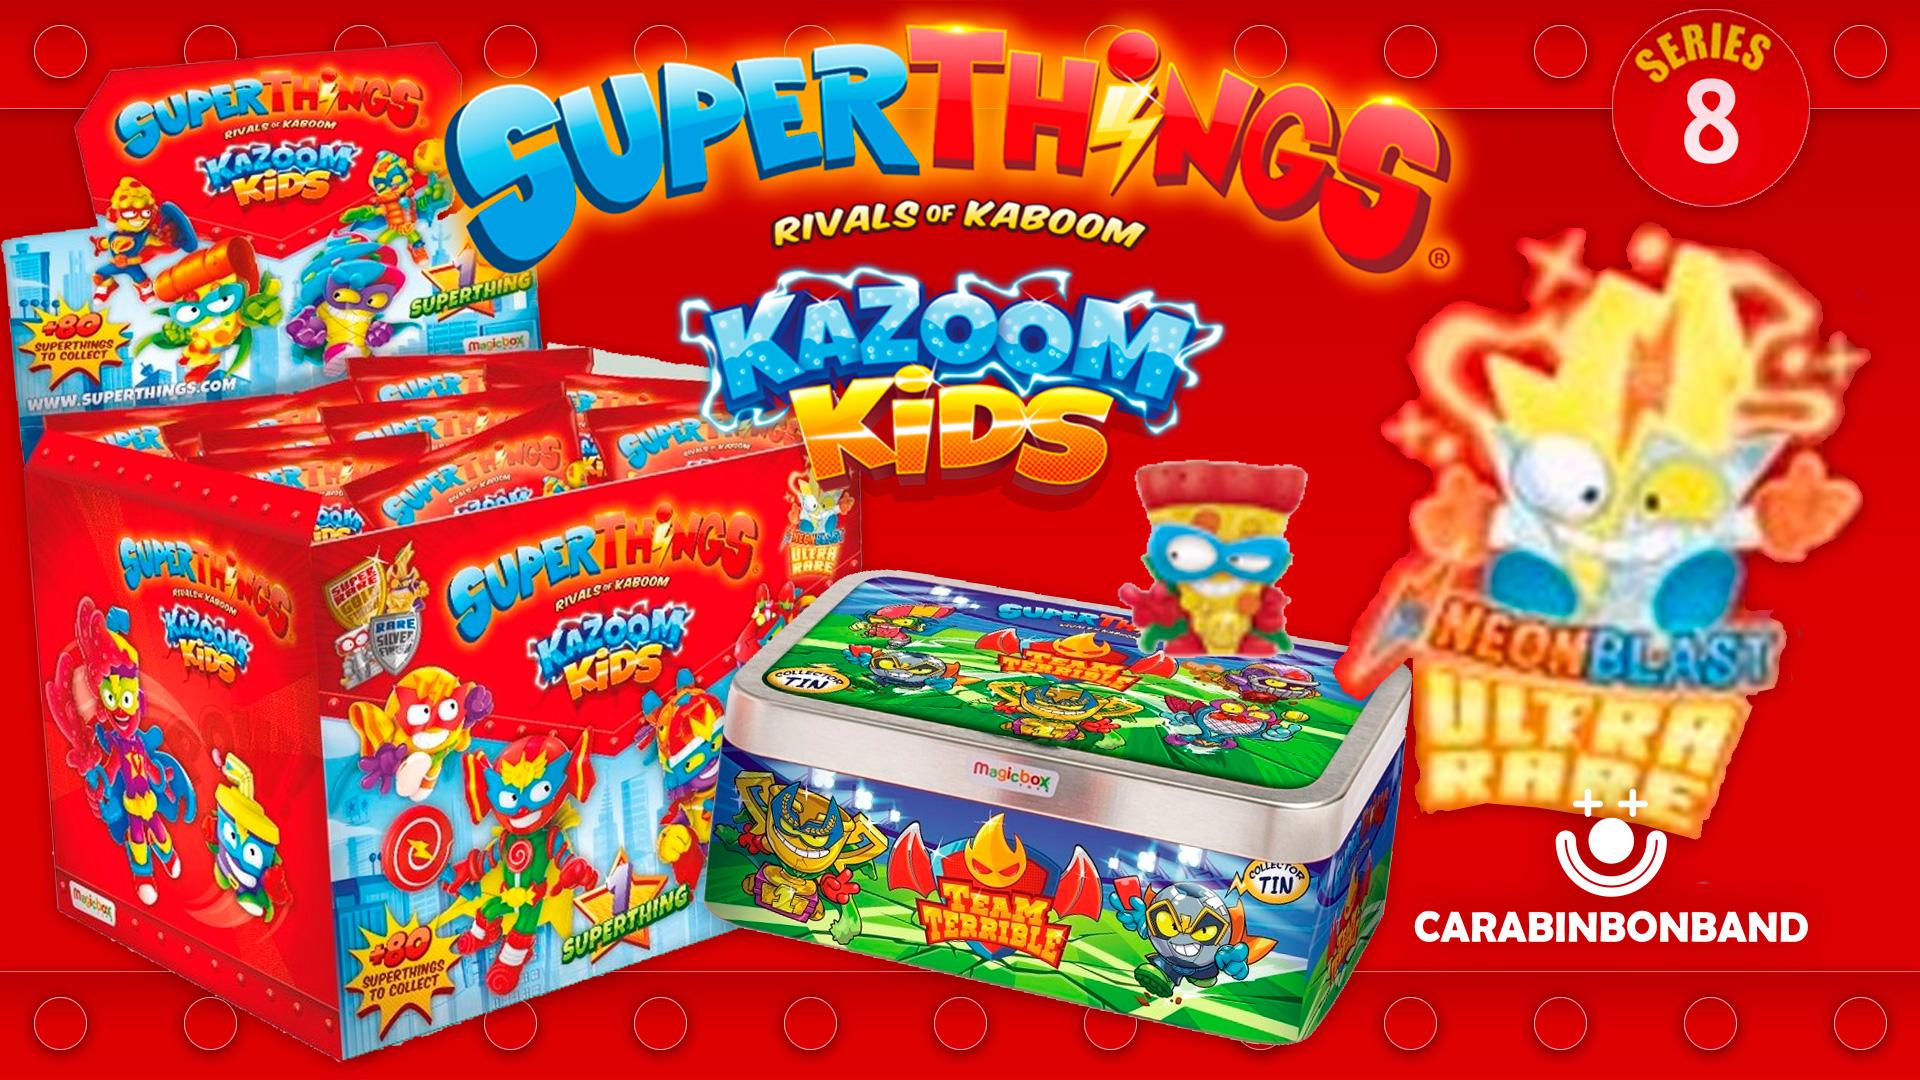 SUPERTHINGS SERIES 8 KAZOOM KIDS - ULTRAROUS, GOLDEN AND MORE NEWS